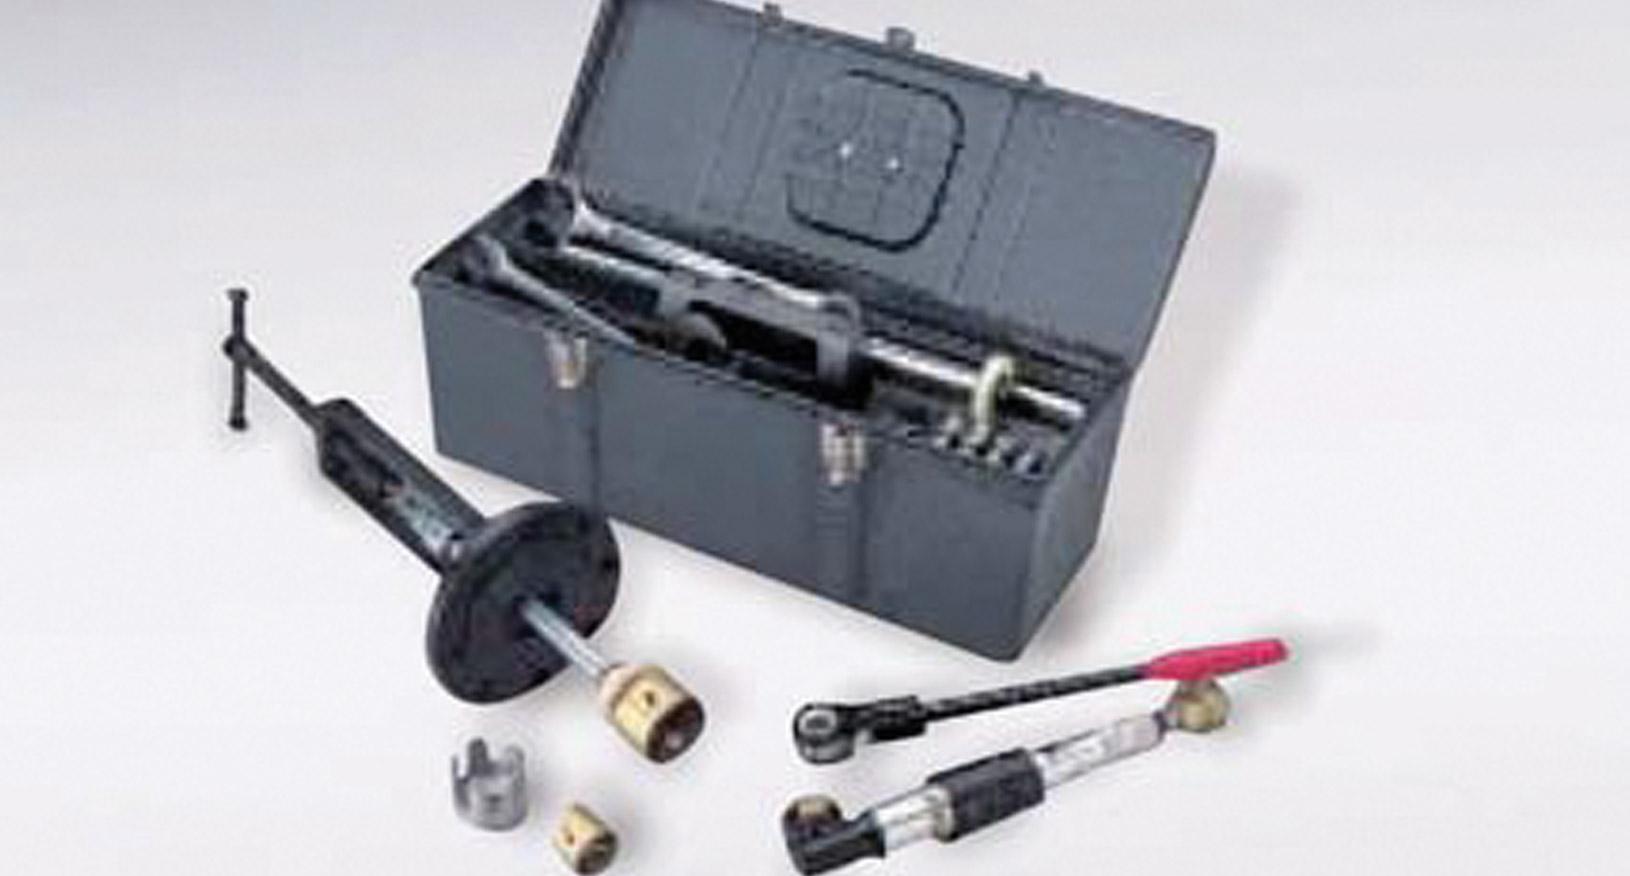 LR67 Under Pressure Drill